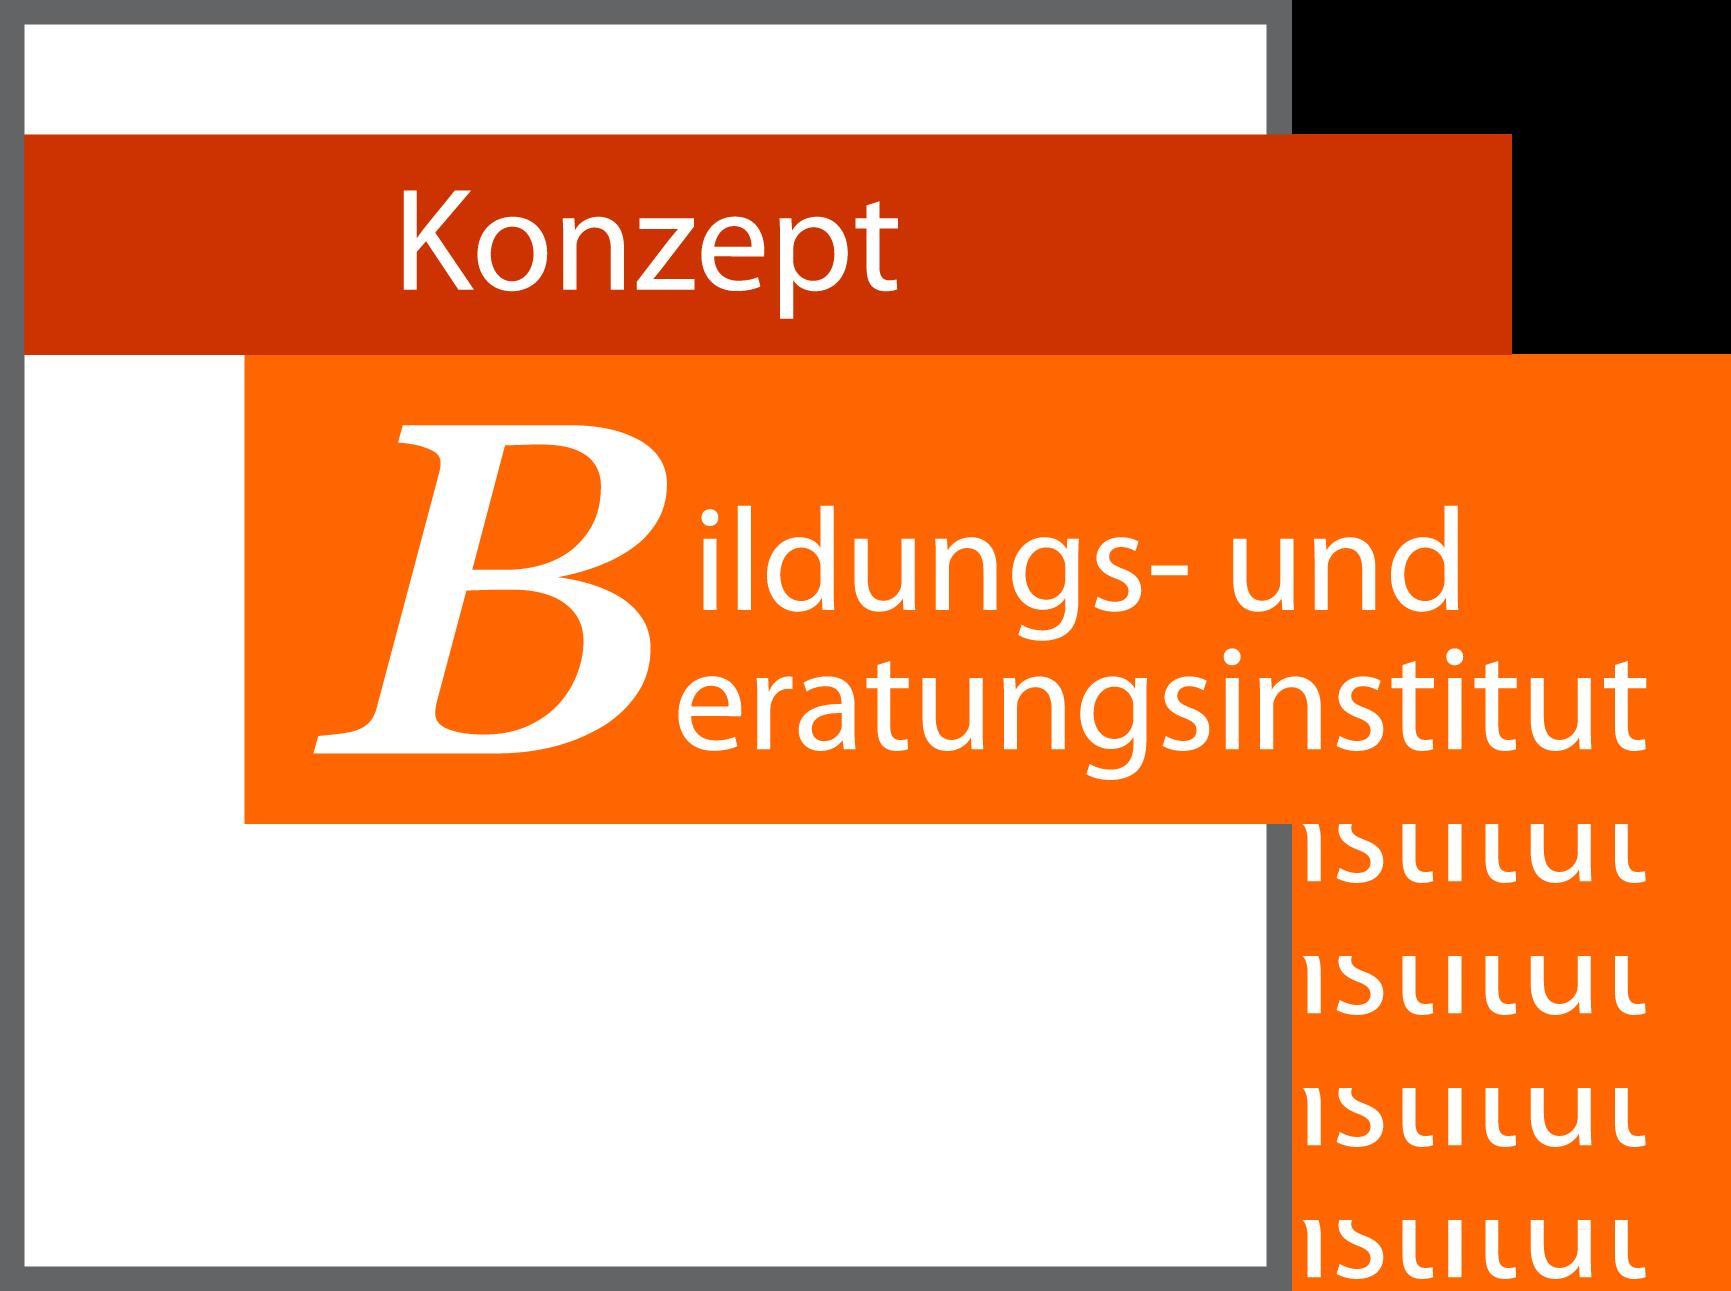 KONZEPT Ltd.